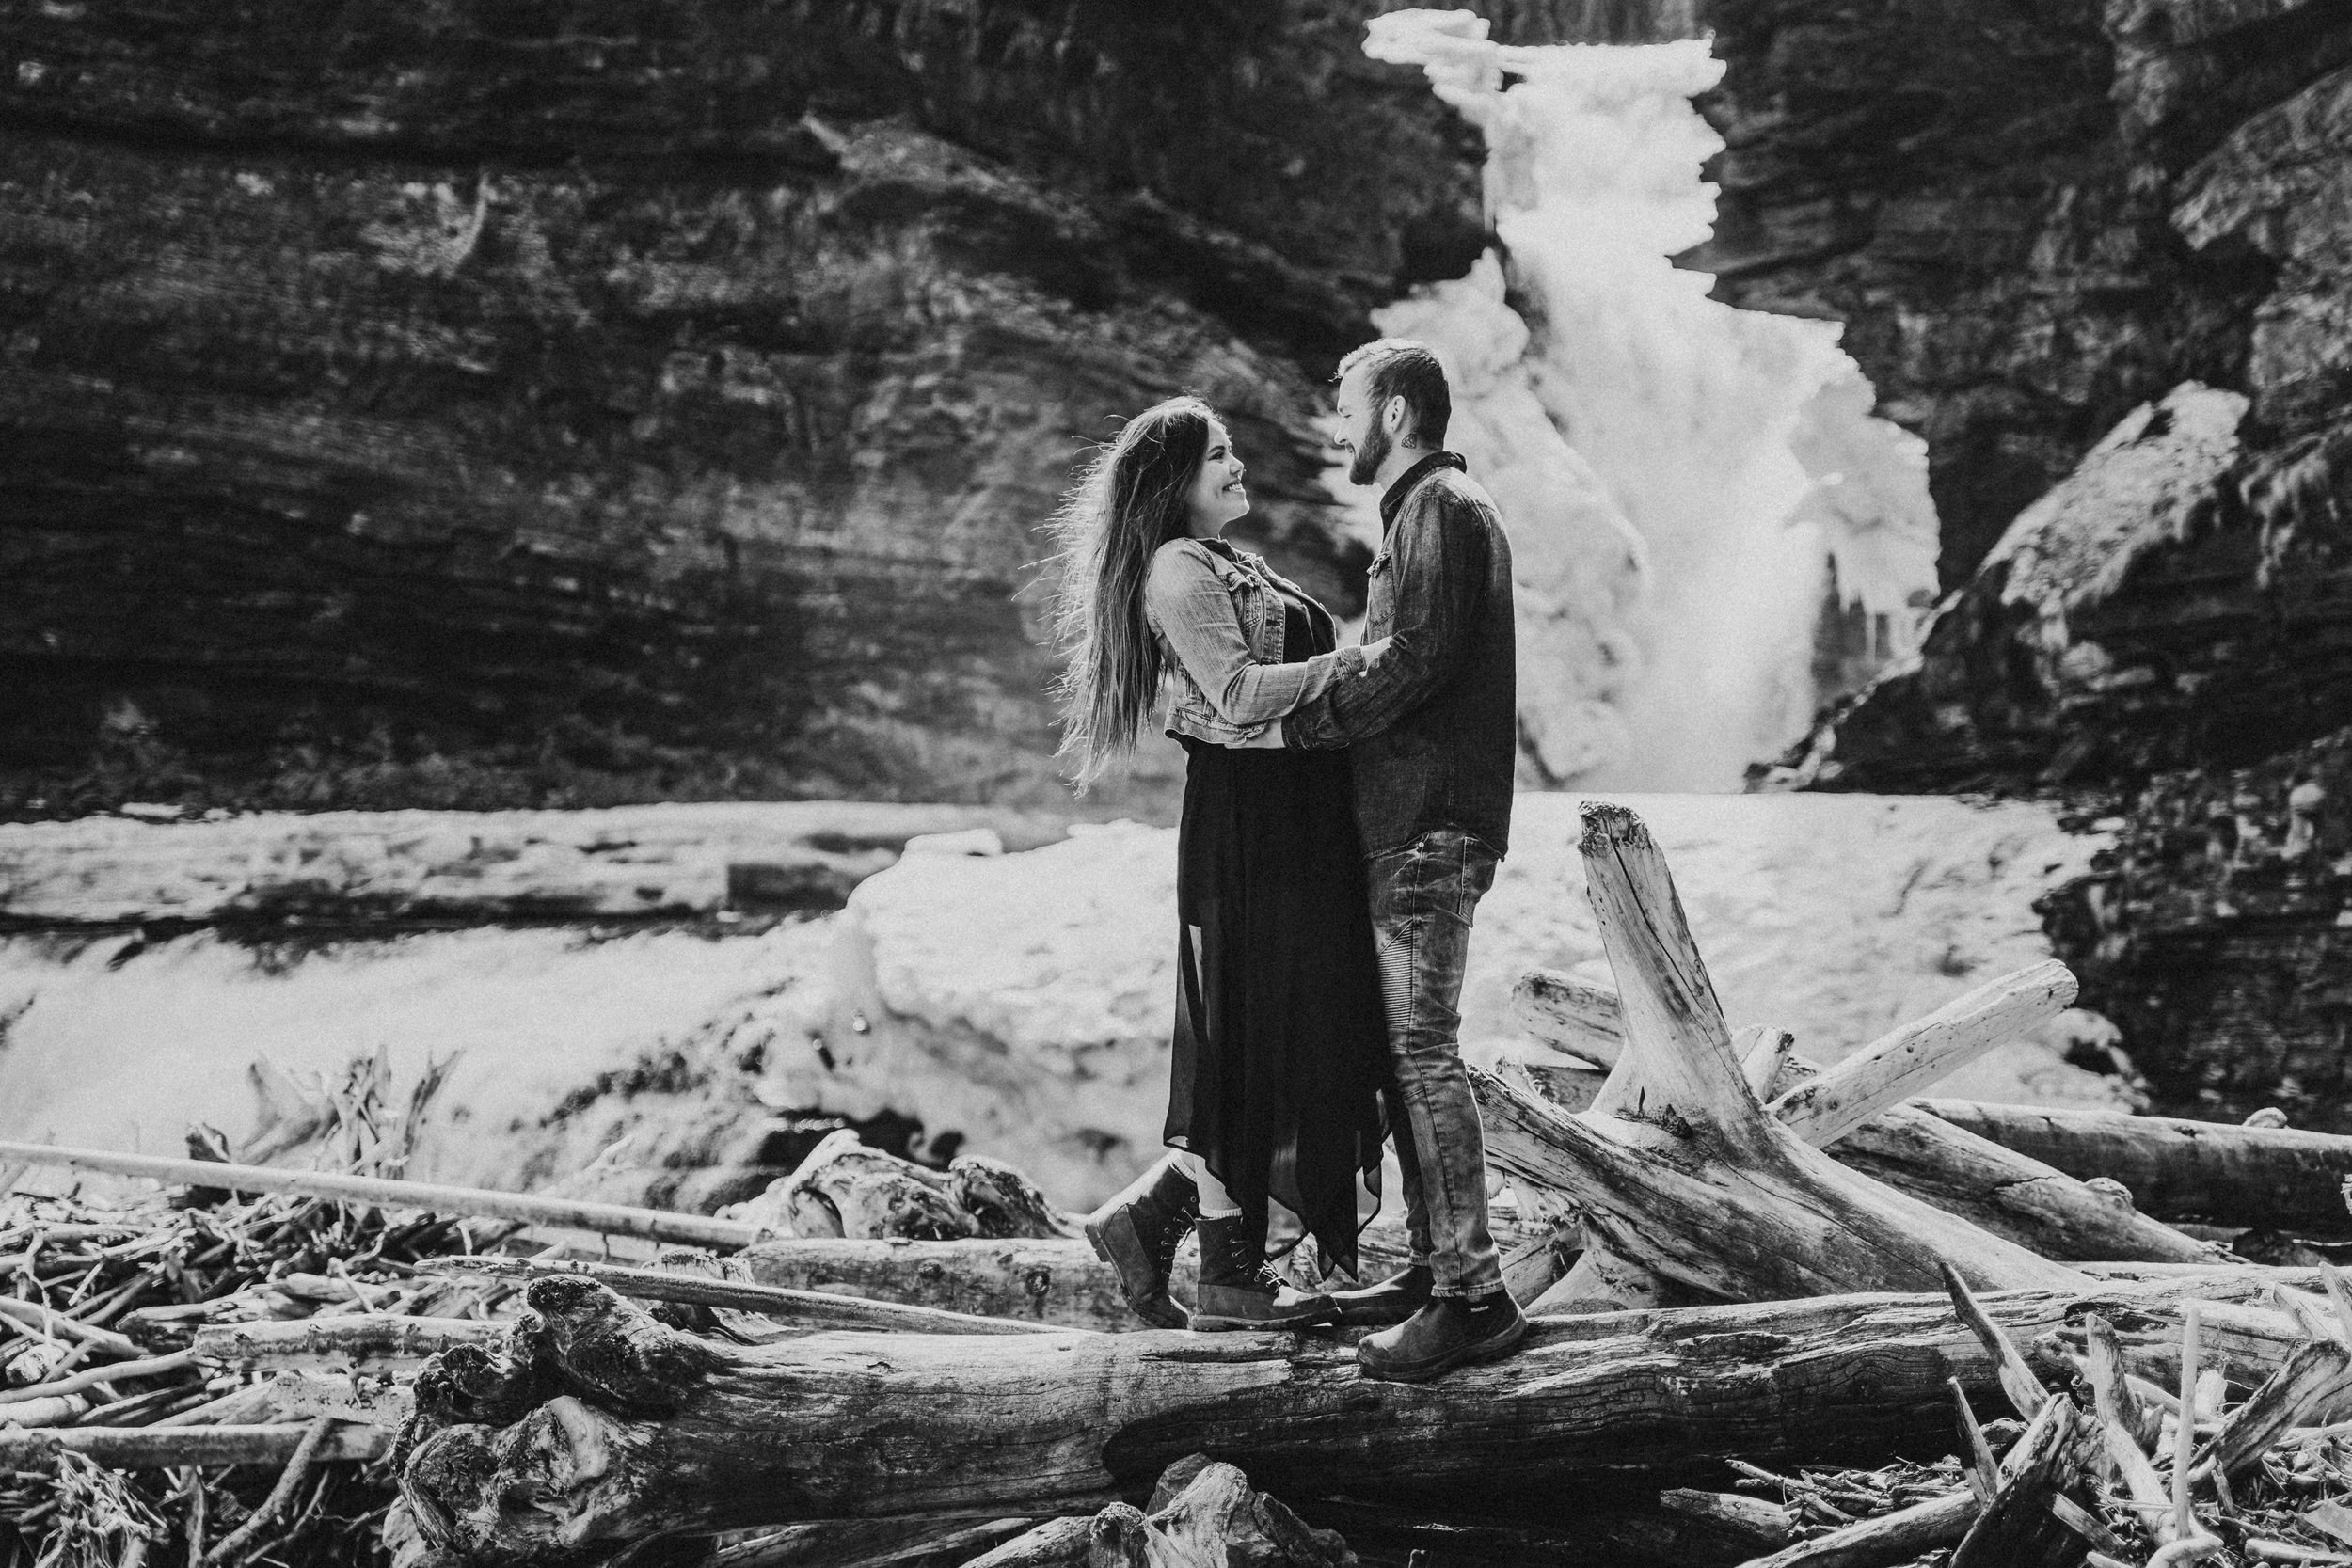 tyraephotography_photographer_wedding_elopement_engagement_photography-04390.jpg